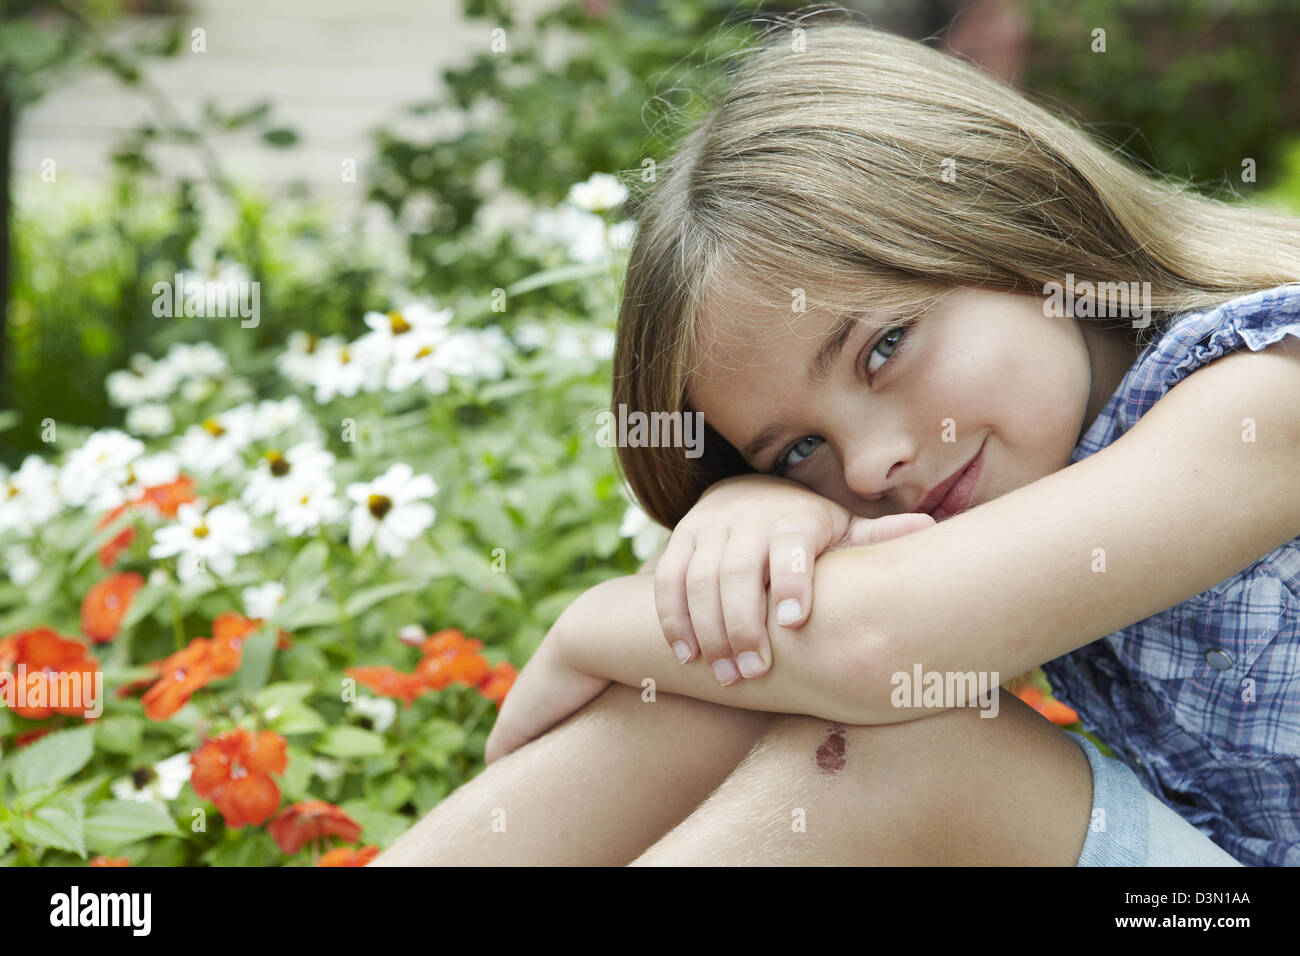 7 Jahre alten Mädchen mit dunkelhäutigen Wounded knee Stockbild